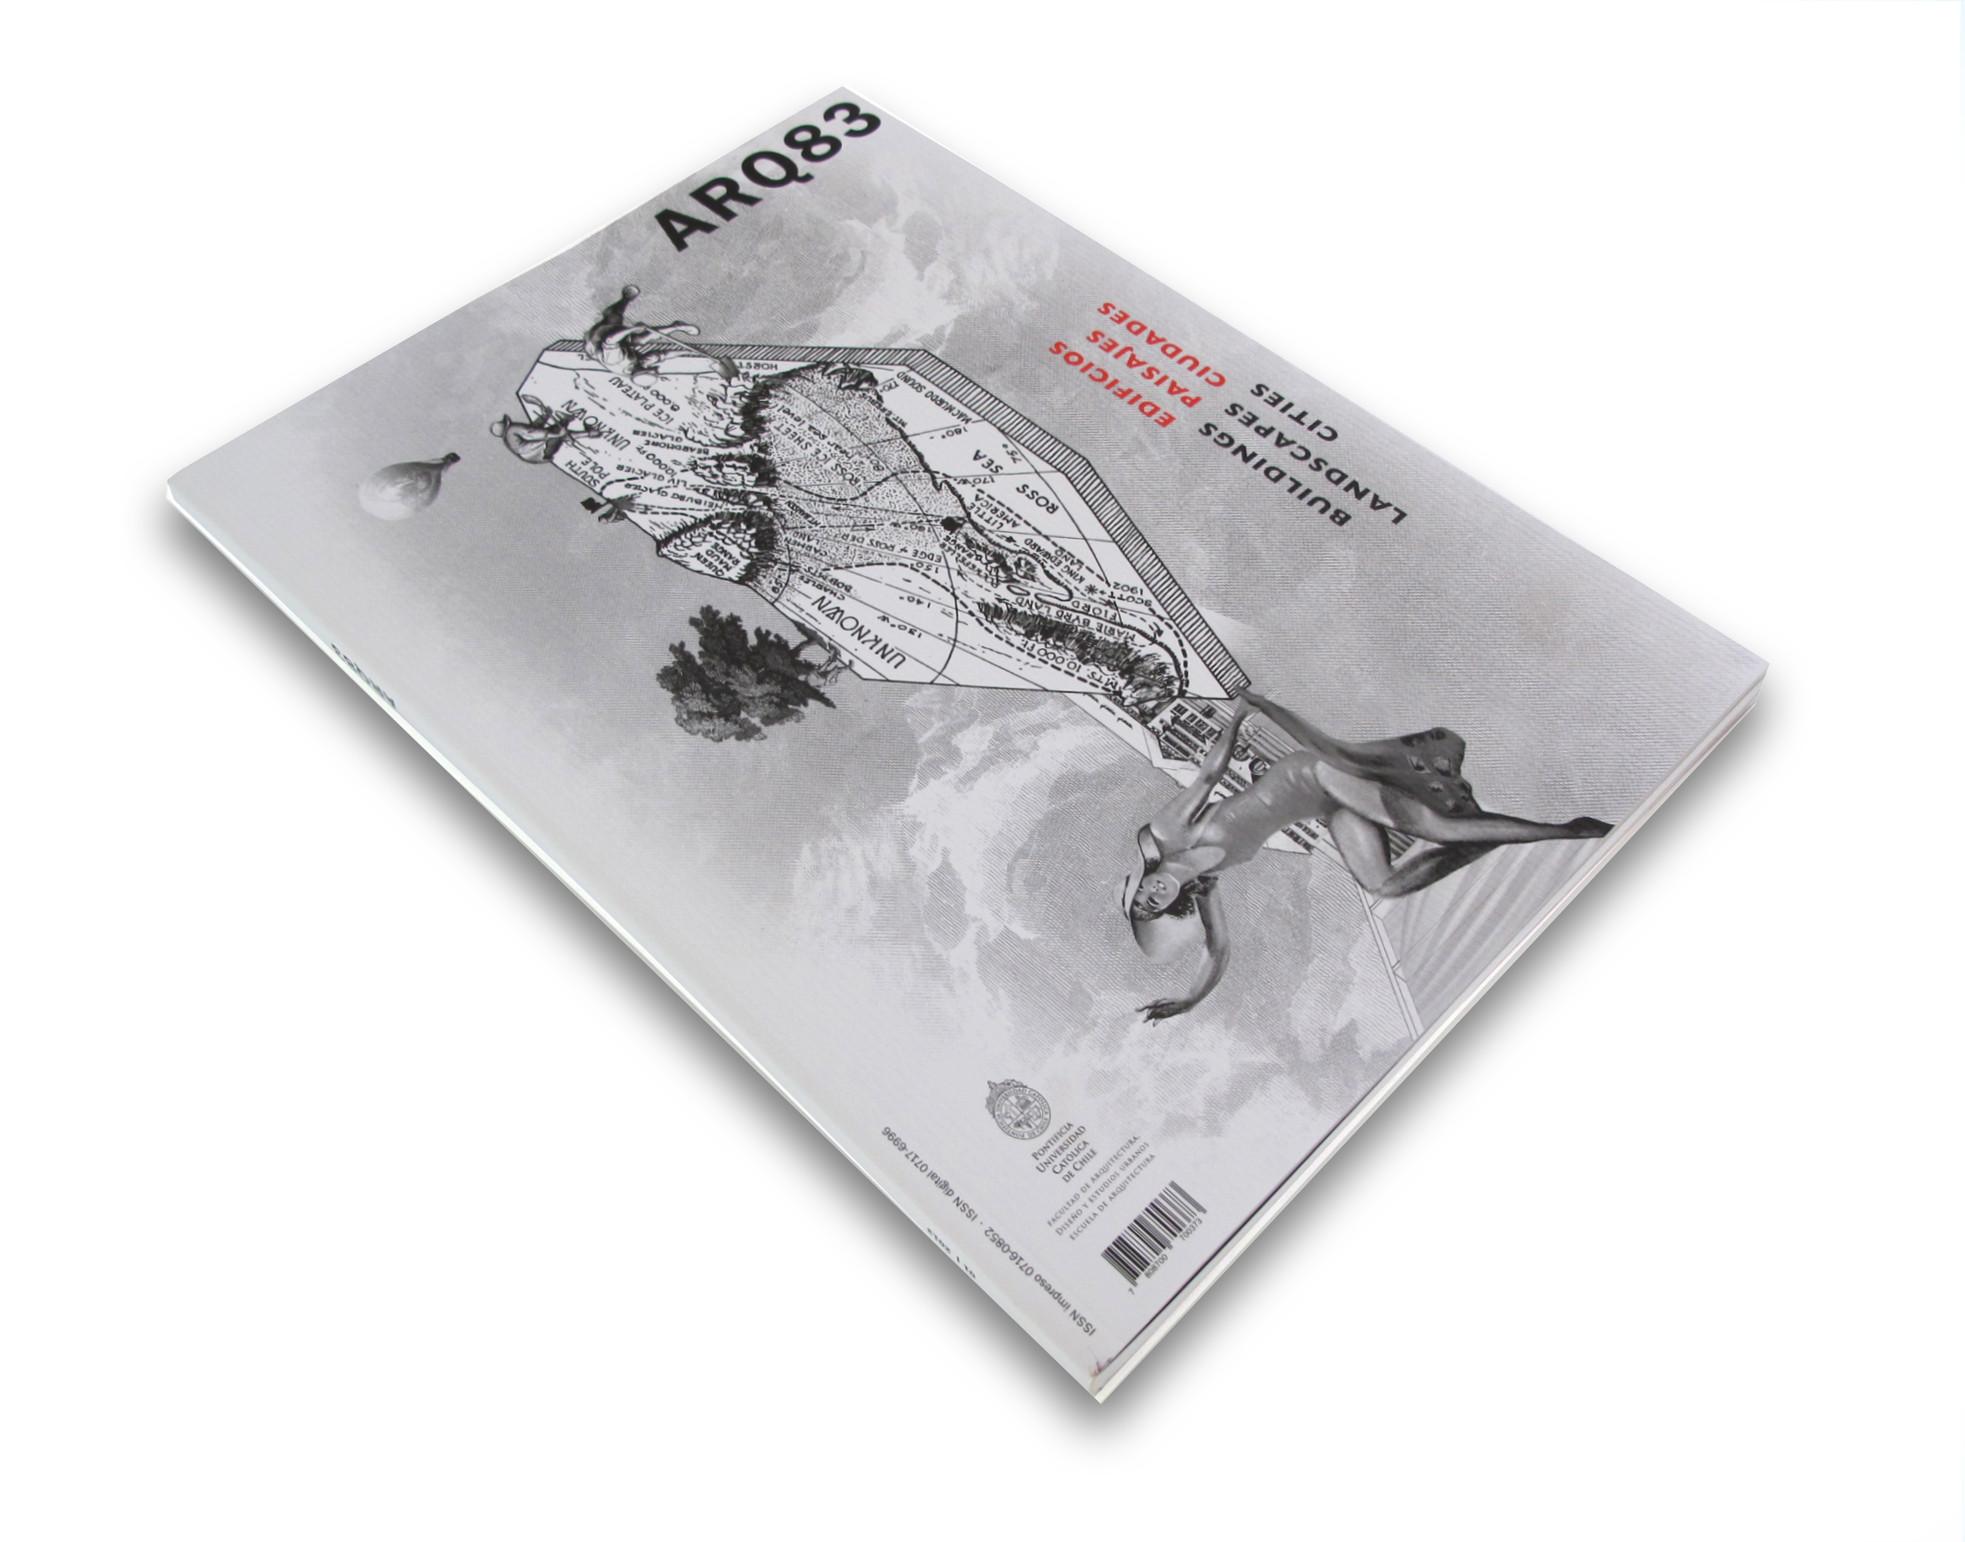 Revista ARQ 83: Edificios, Paisajes, Ciudades